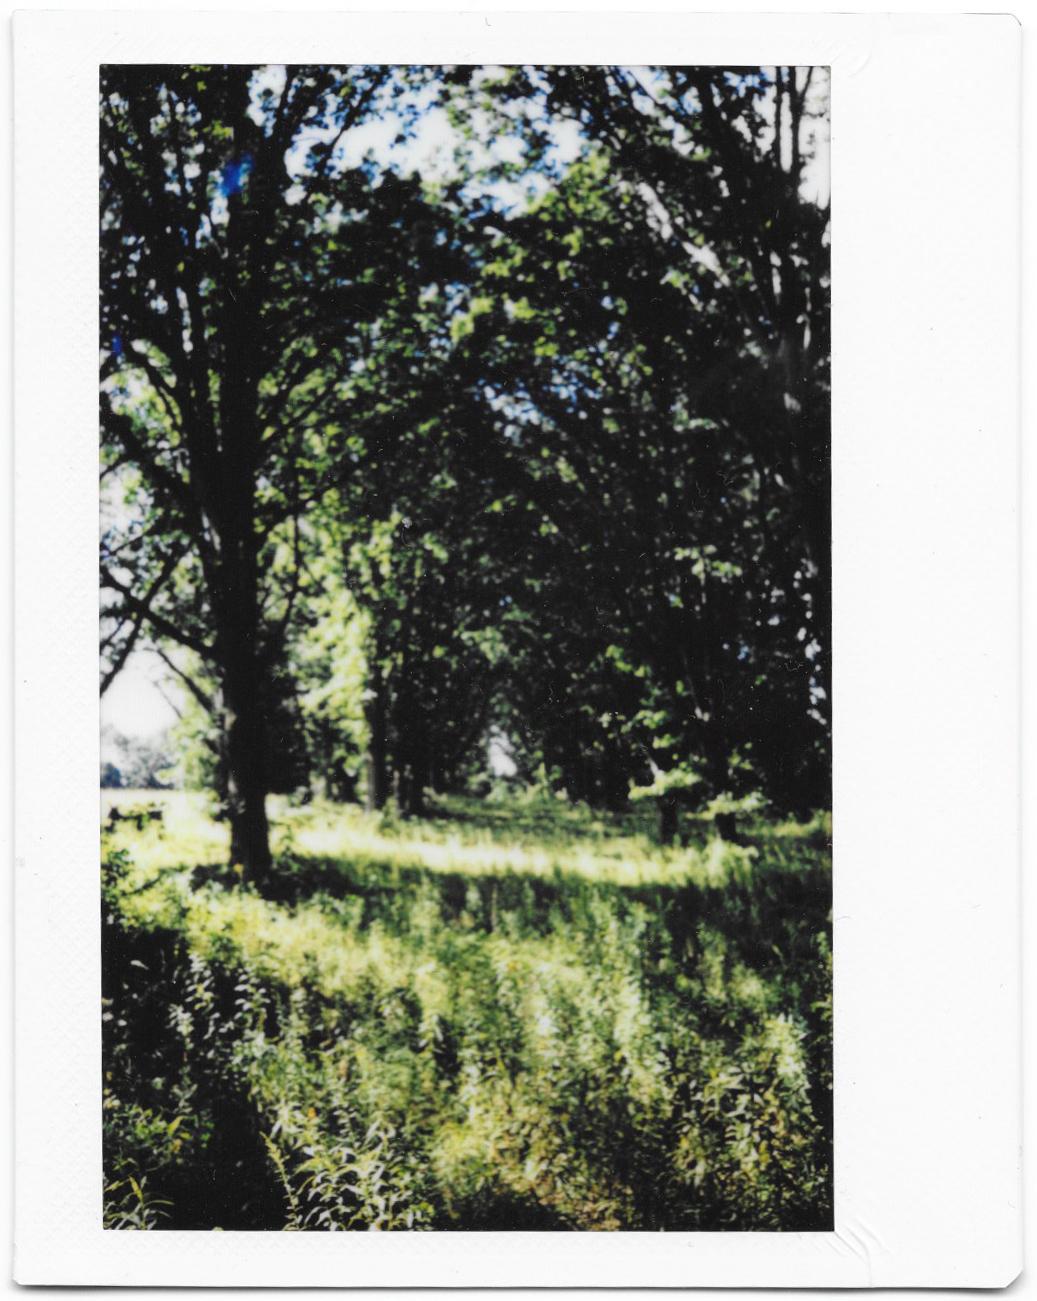 oaktrees.jpg